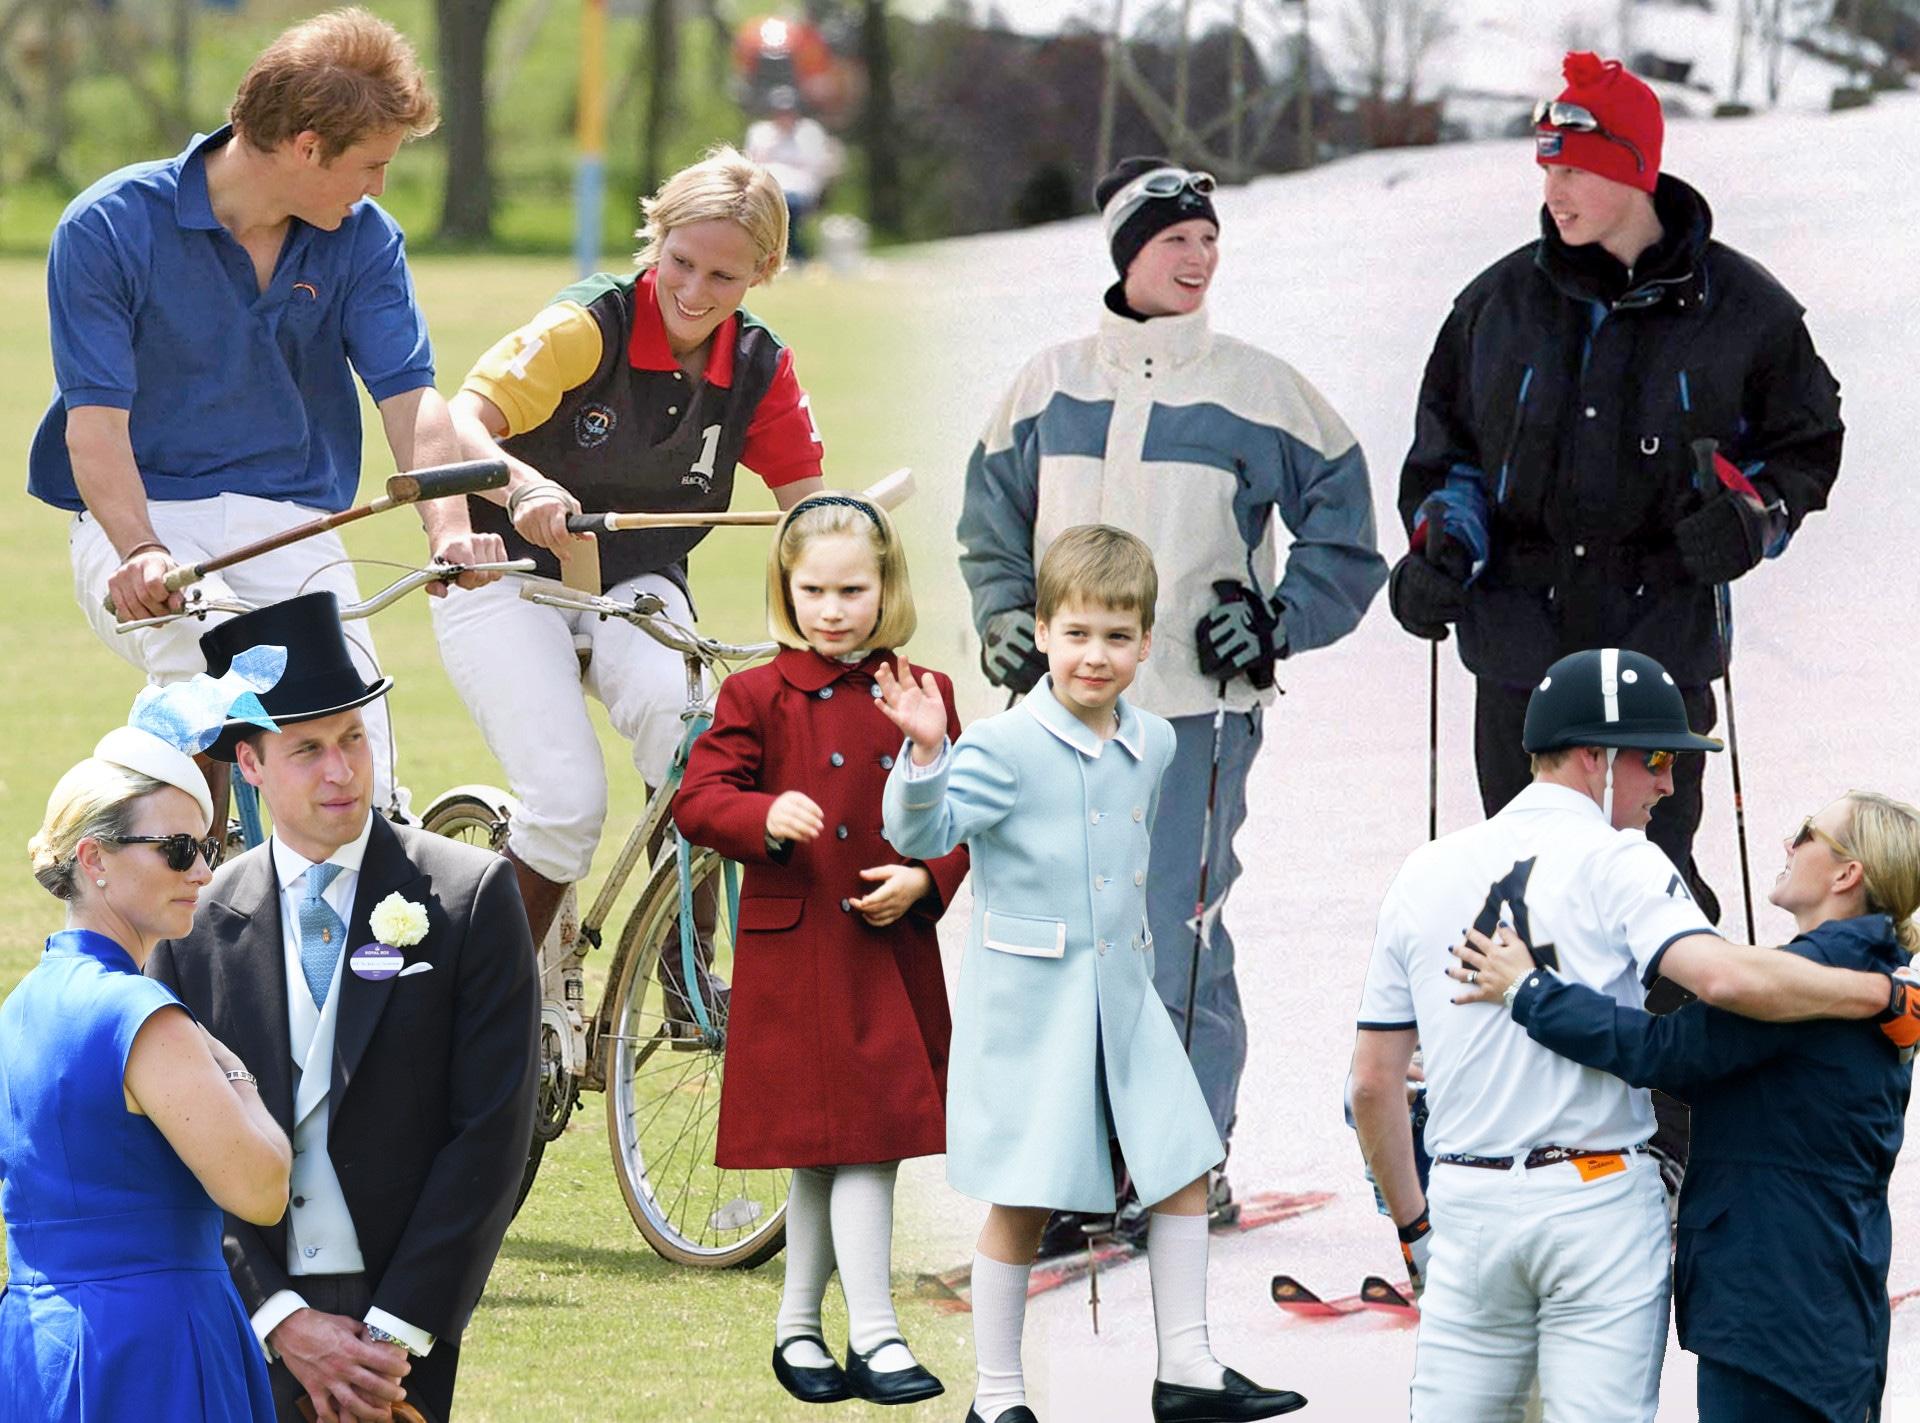 Prince William, Zara Tindall, Friendship Feature